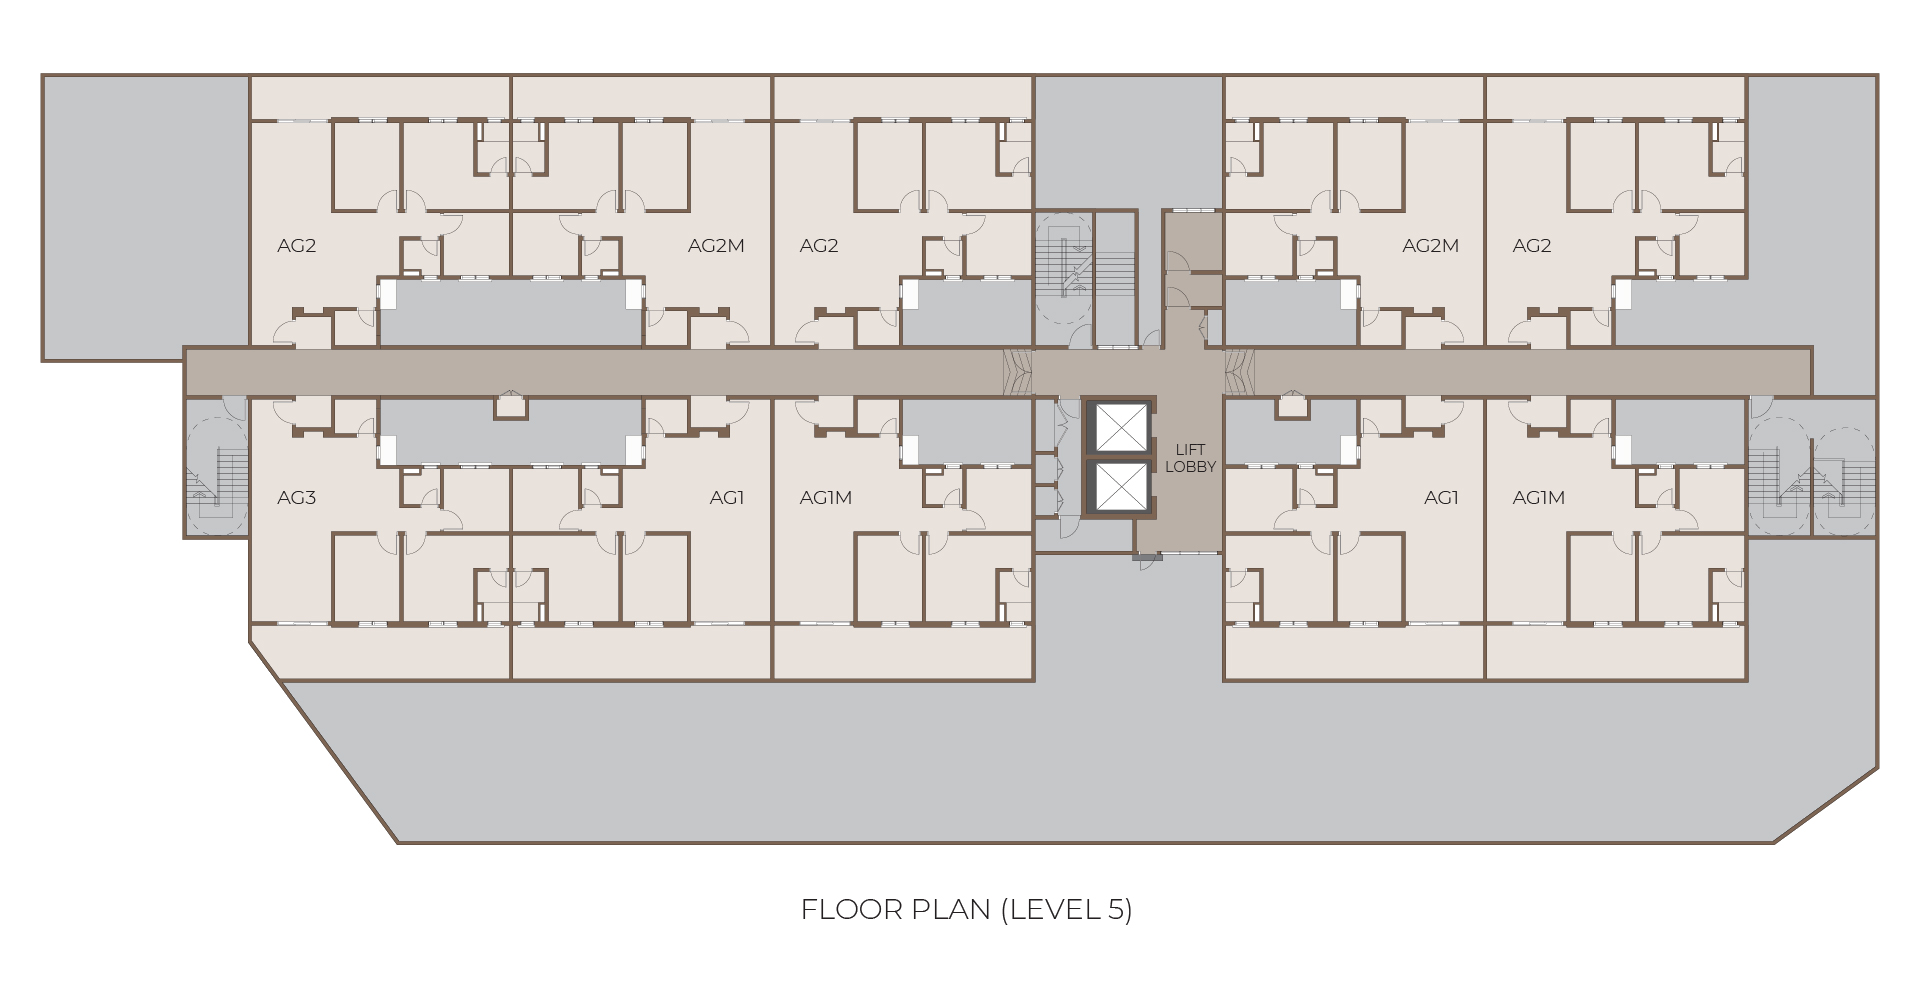 Senesta_Floor-Plan-Level-5